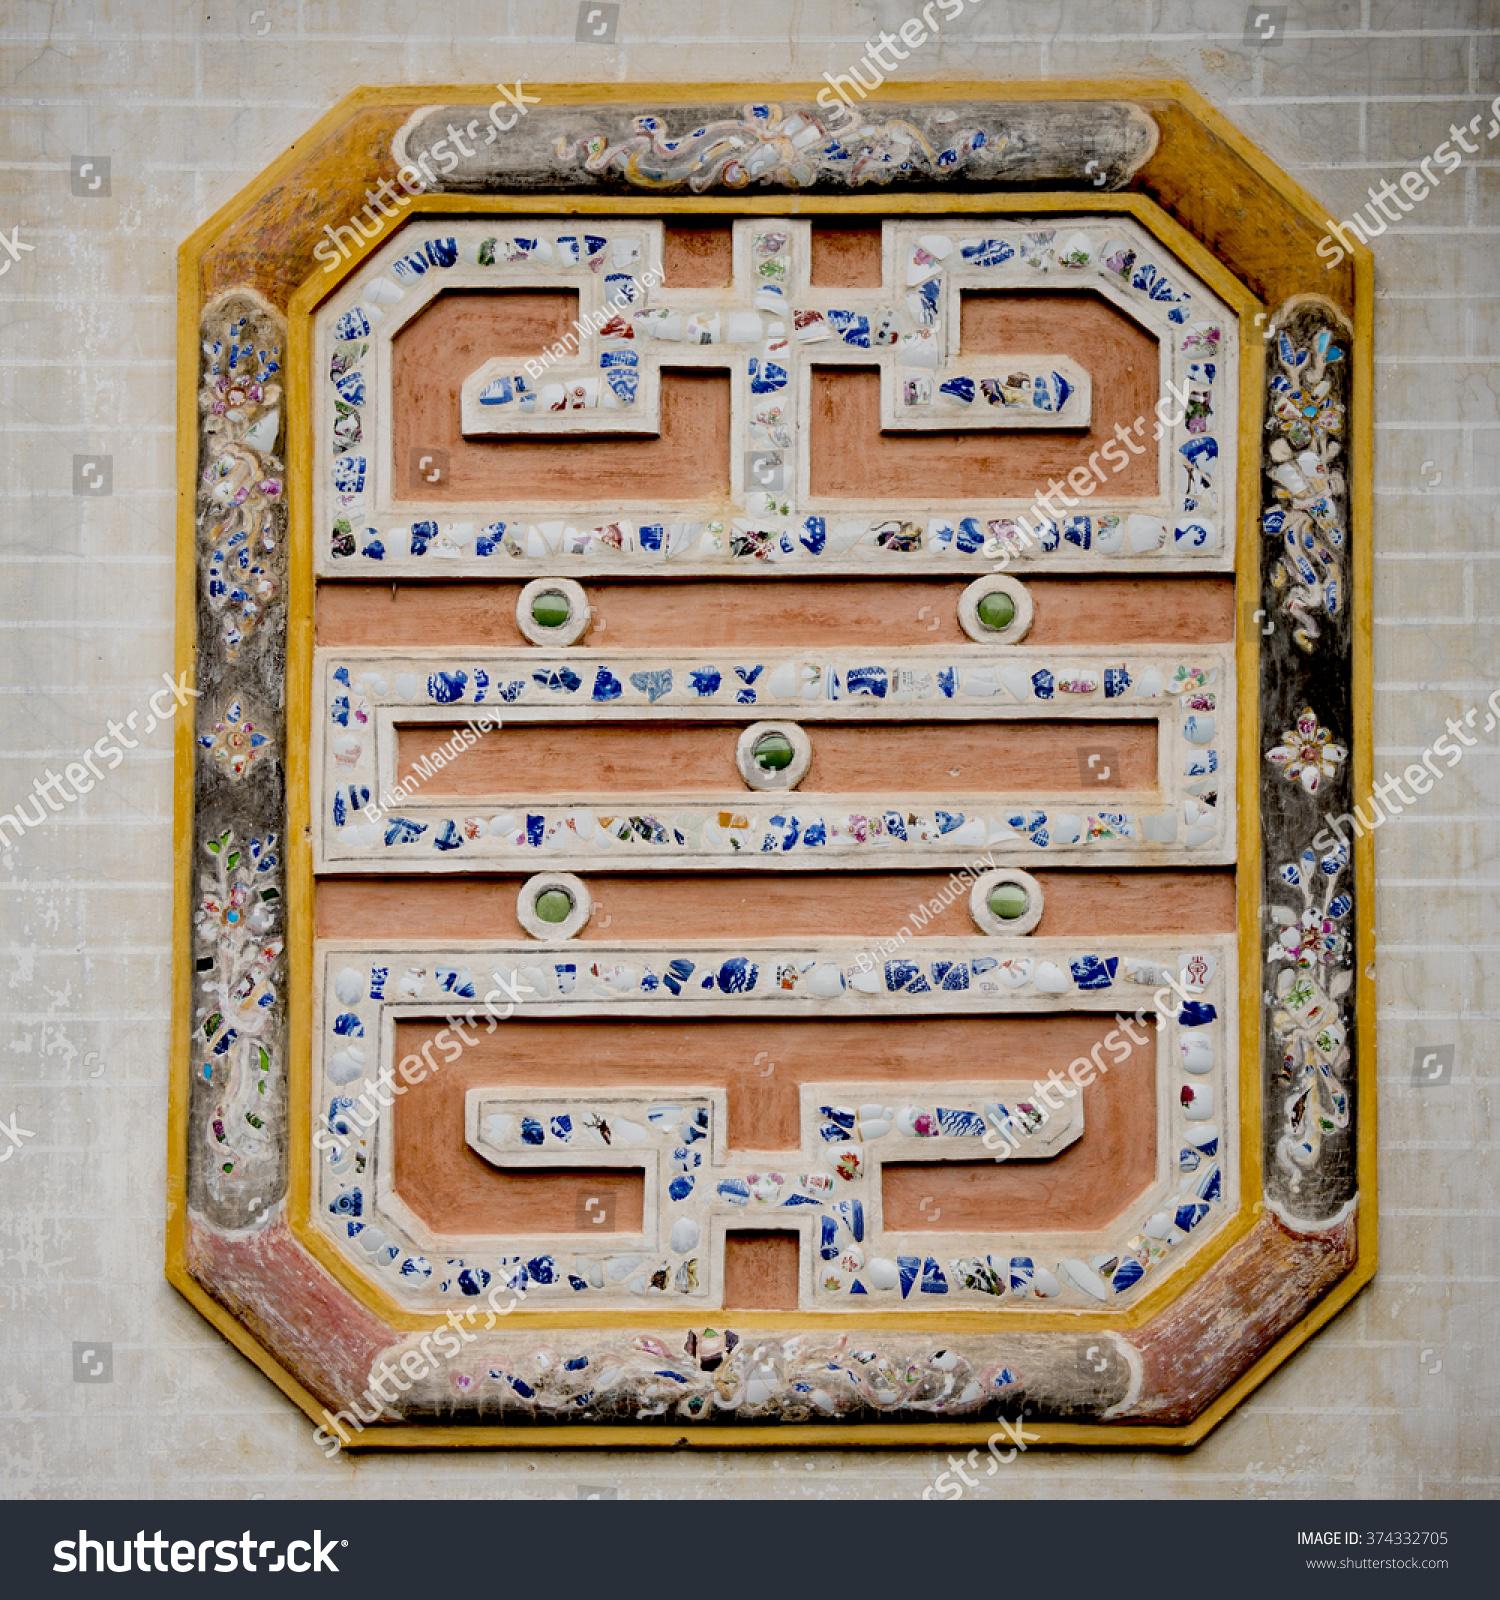 Royalty Free Ceramic Mosaic Of The Chinese Symbol 374332705 Stock